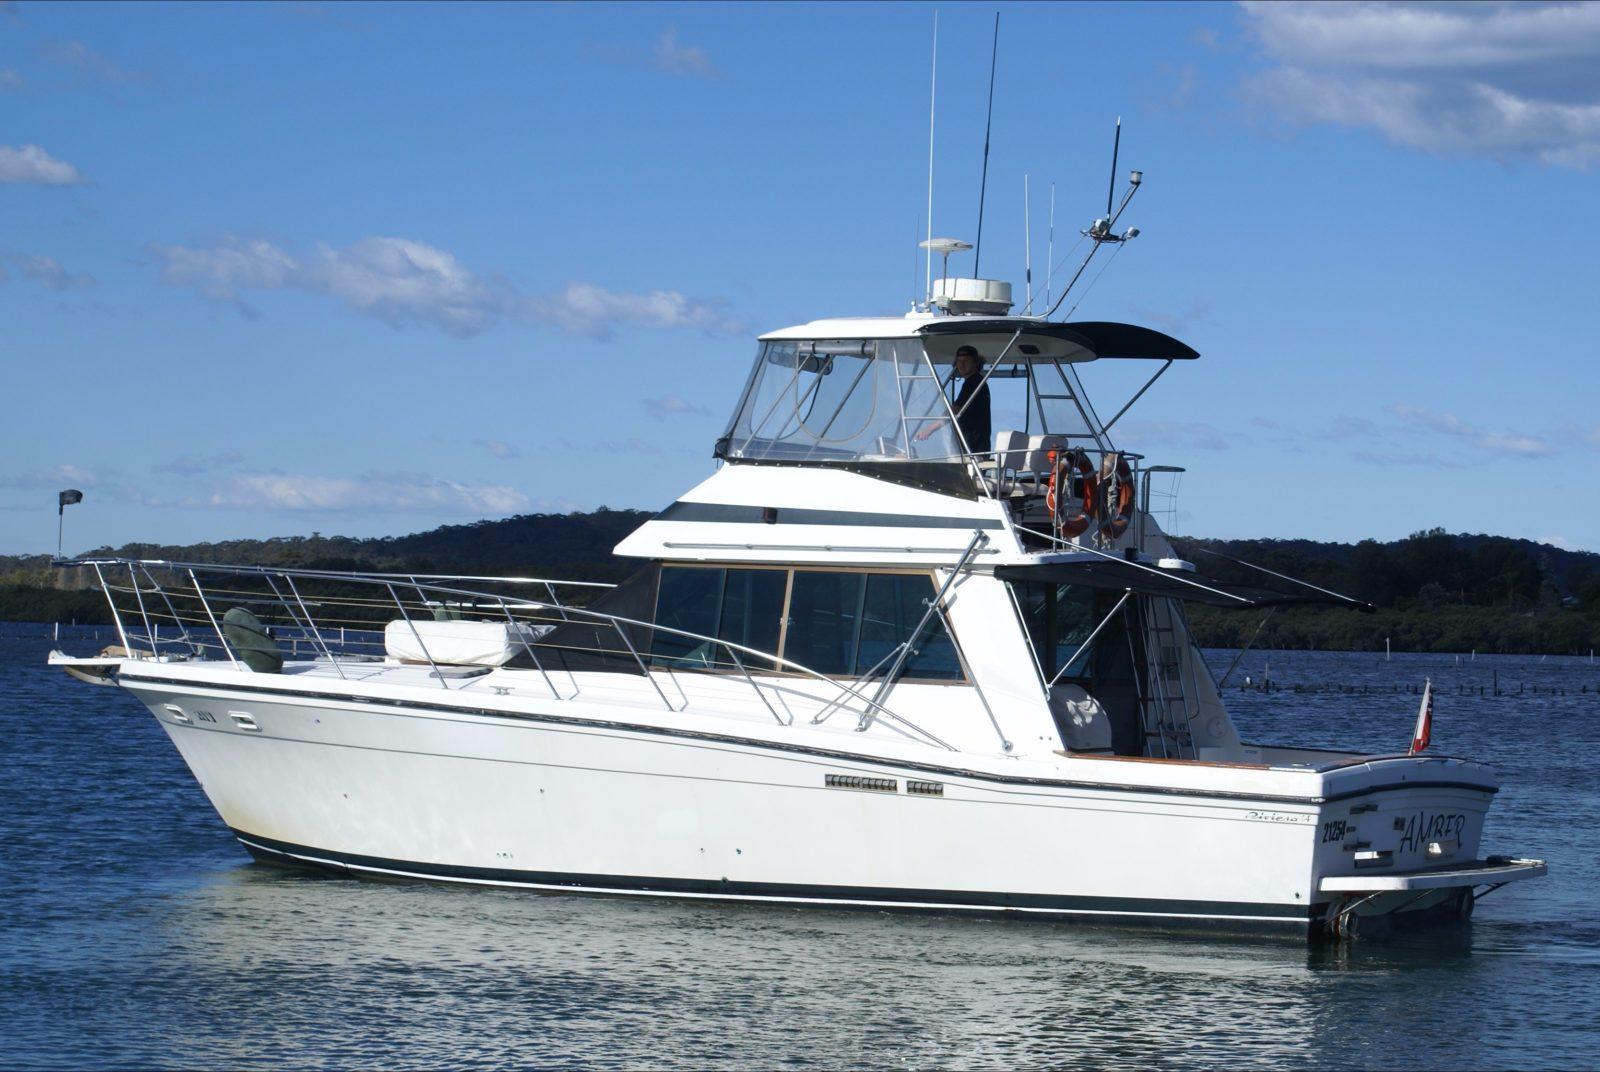 Sydney by Boat